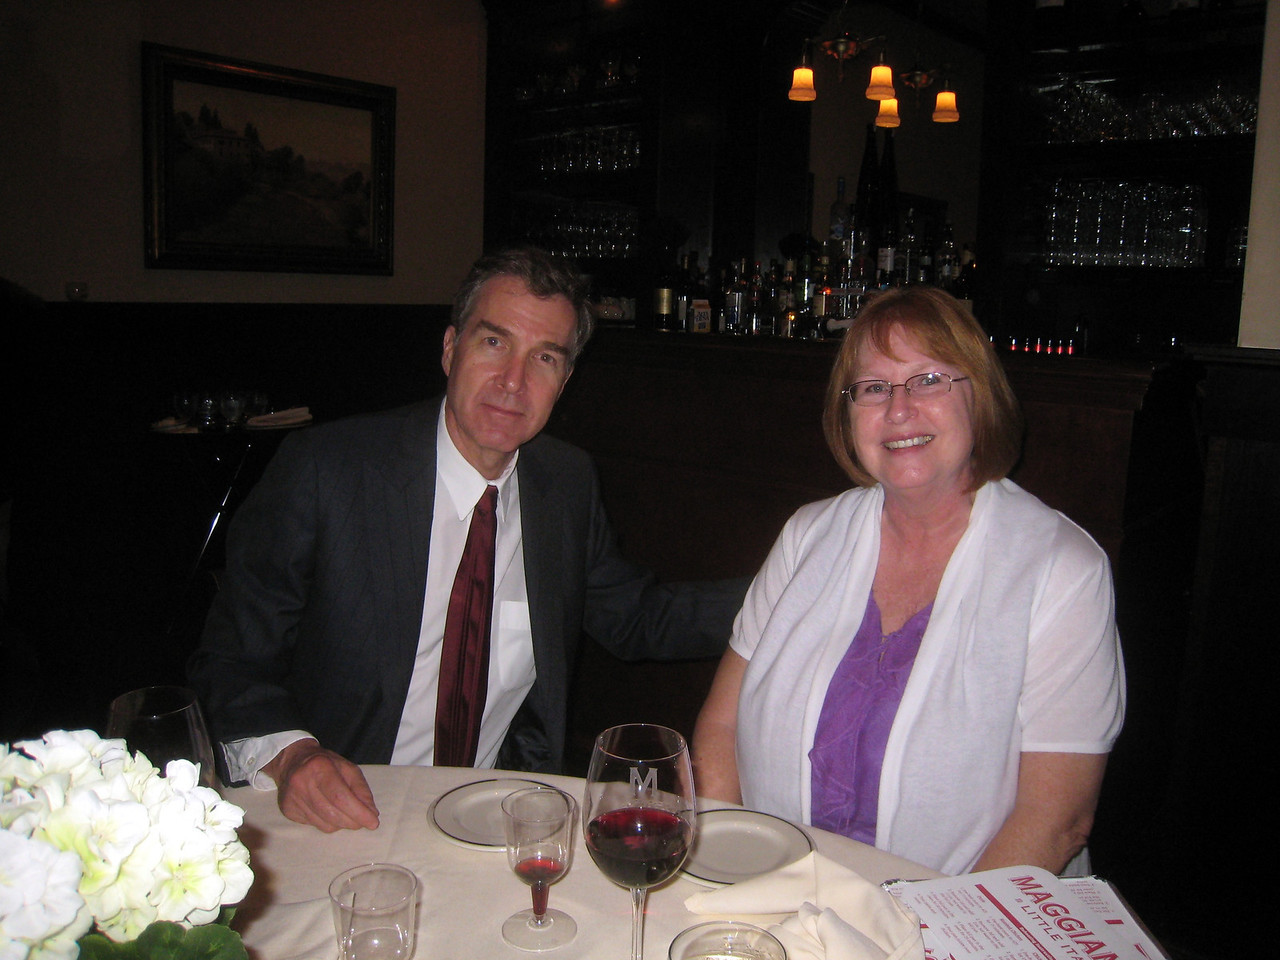 John Maher and Donna McPride